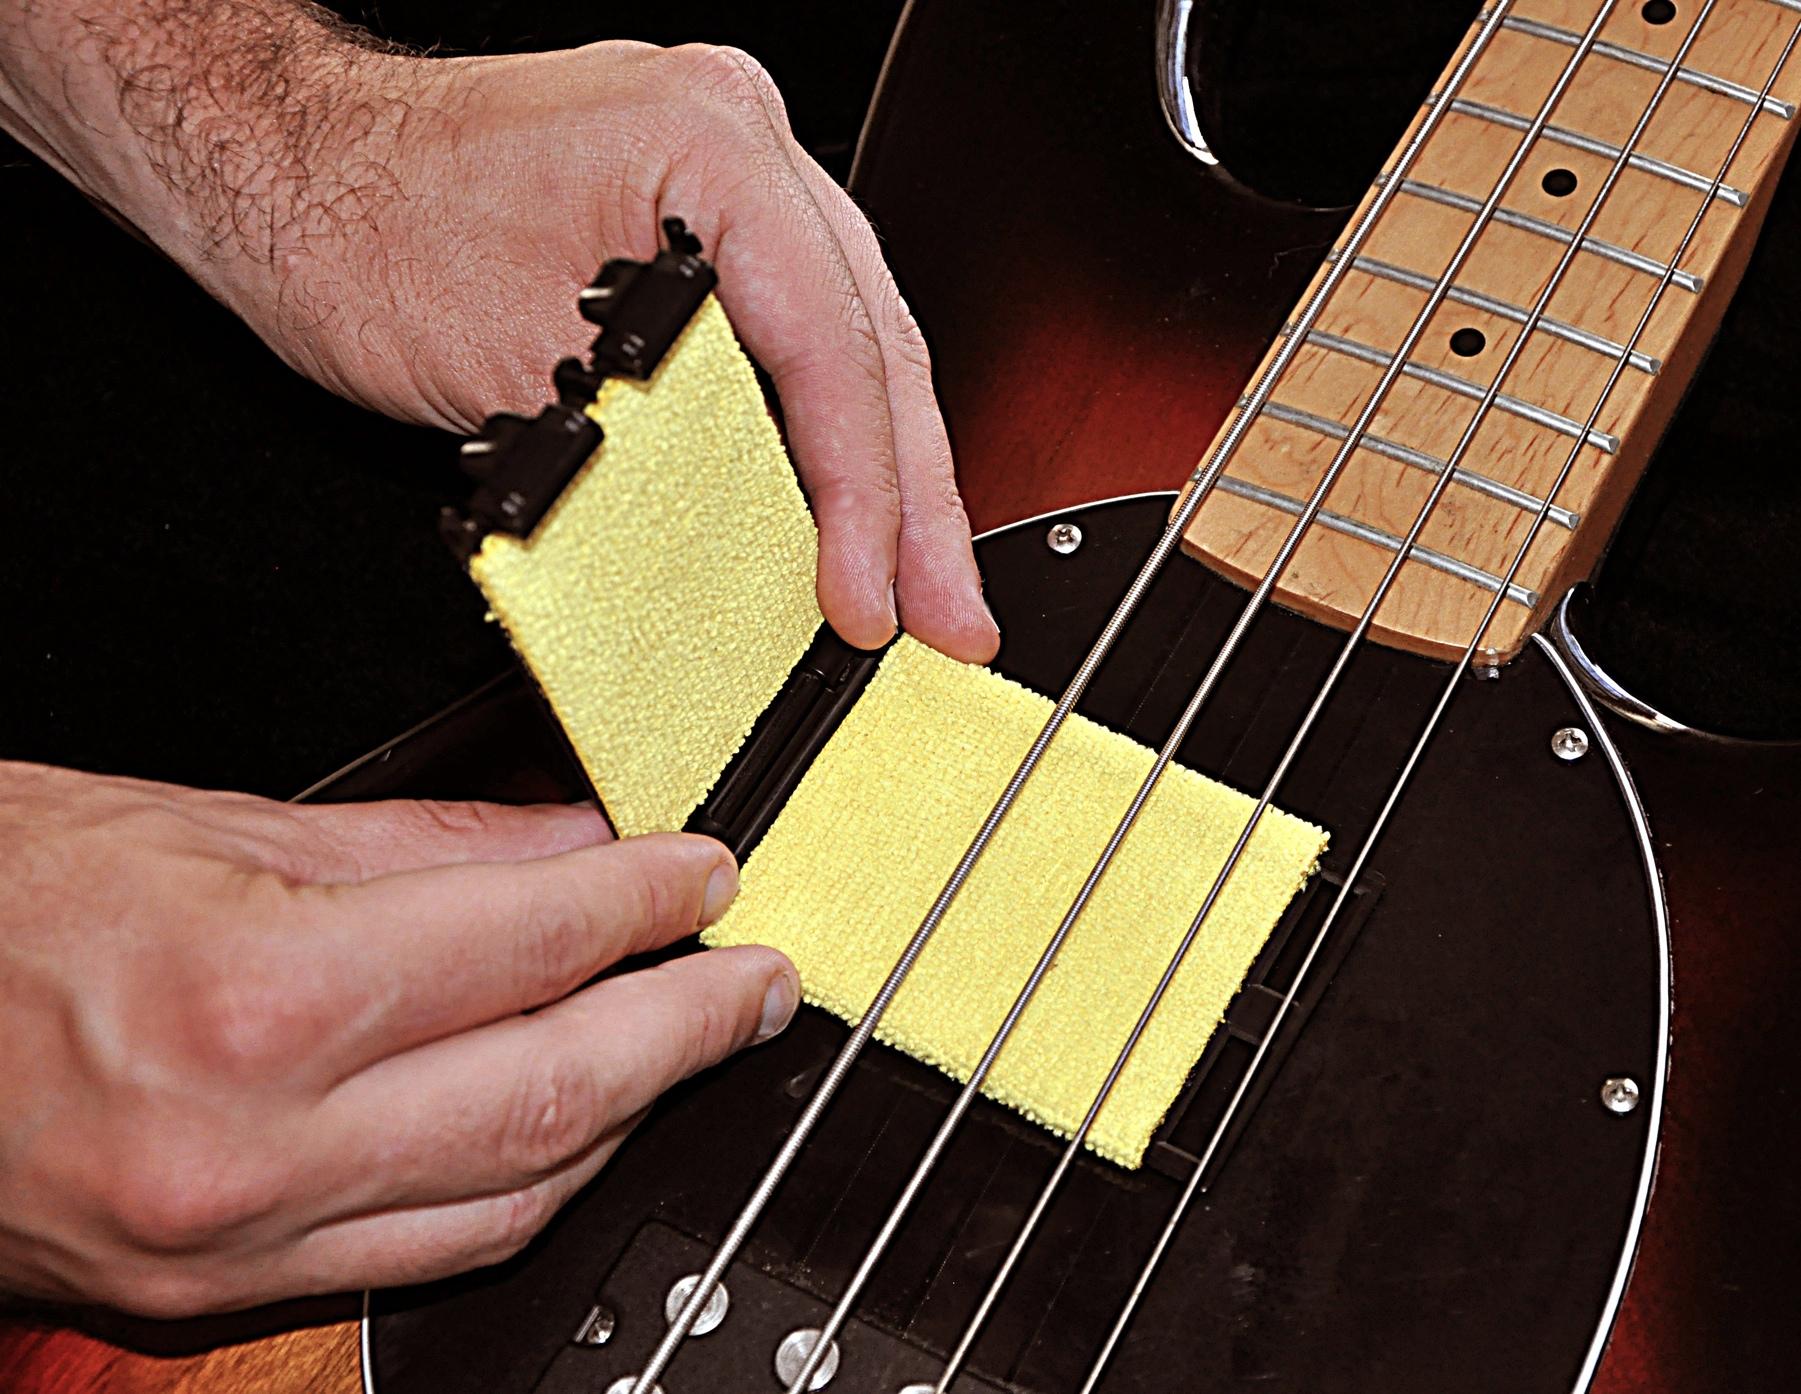 tone gear the guitar string cleaner image 594686 audiofanzine. Black Bedroom Furniture Sets. Home Design Ideas